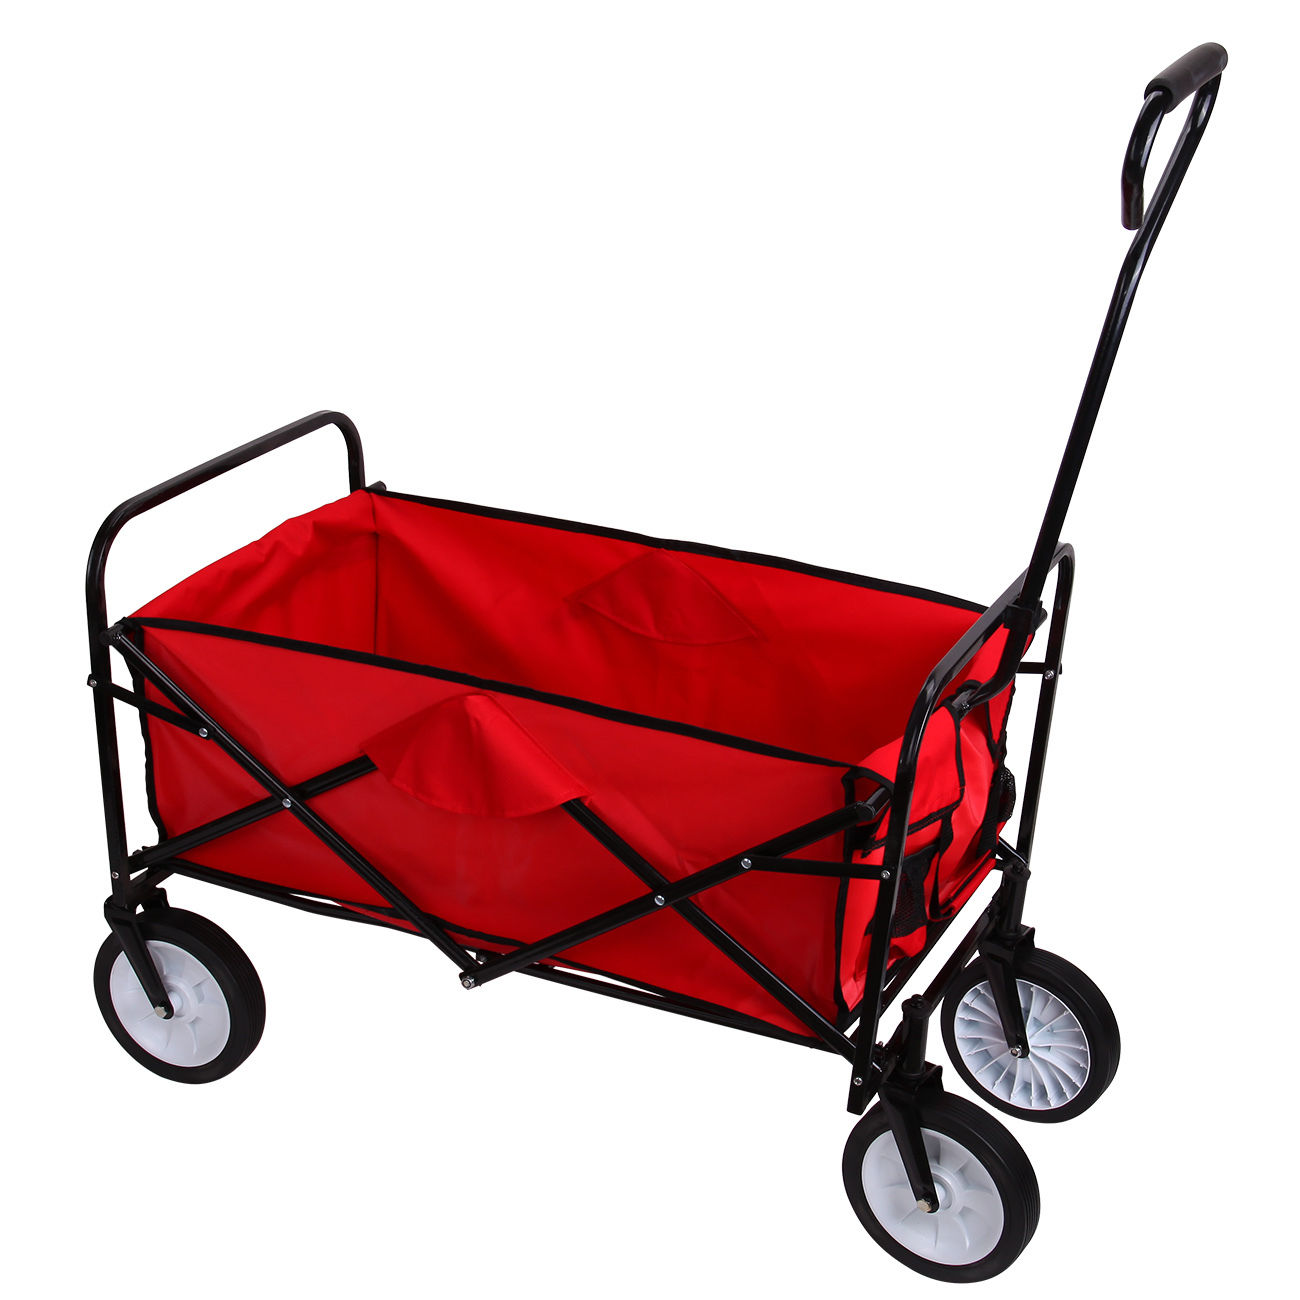 Four Wheeler Pulling Wagon : Heavy duty utility garden folding tool cart wagon wheel